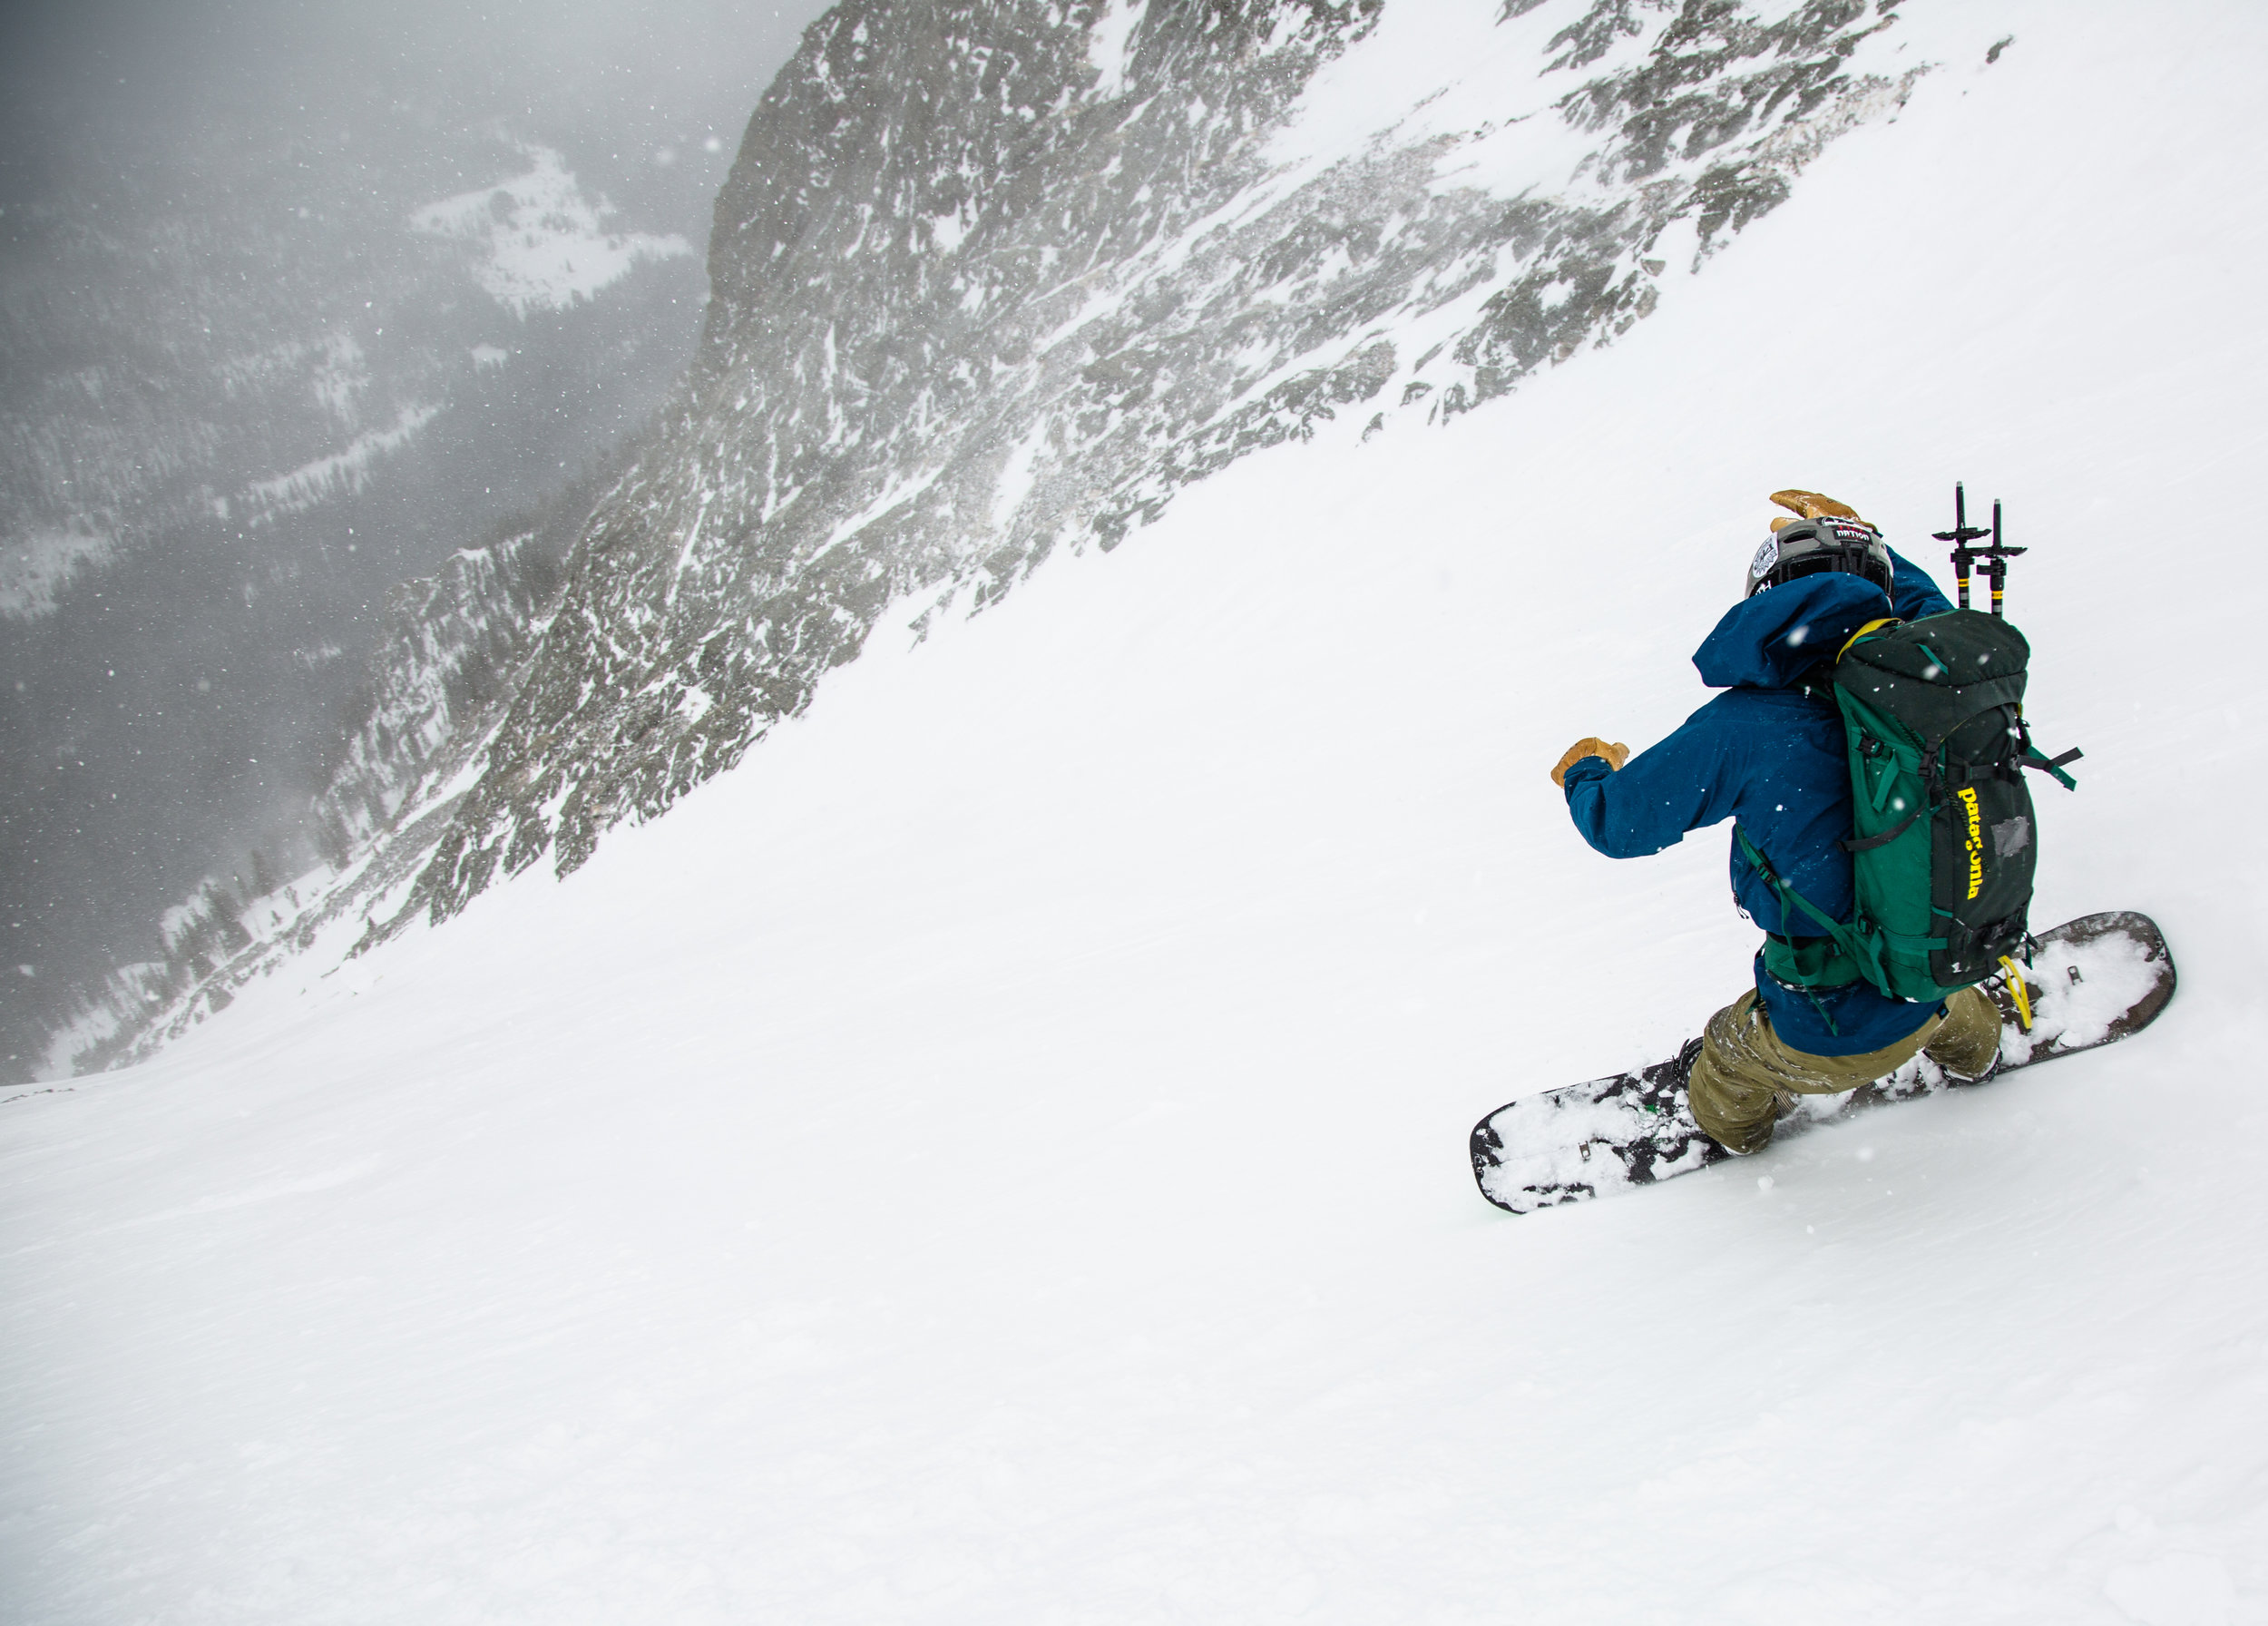 JTG_Skiing-10.jpg